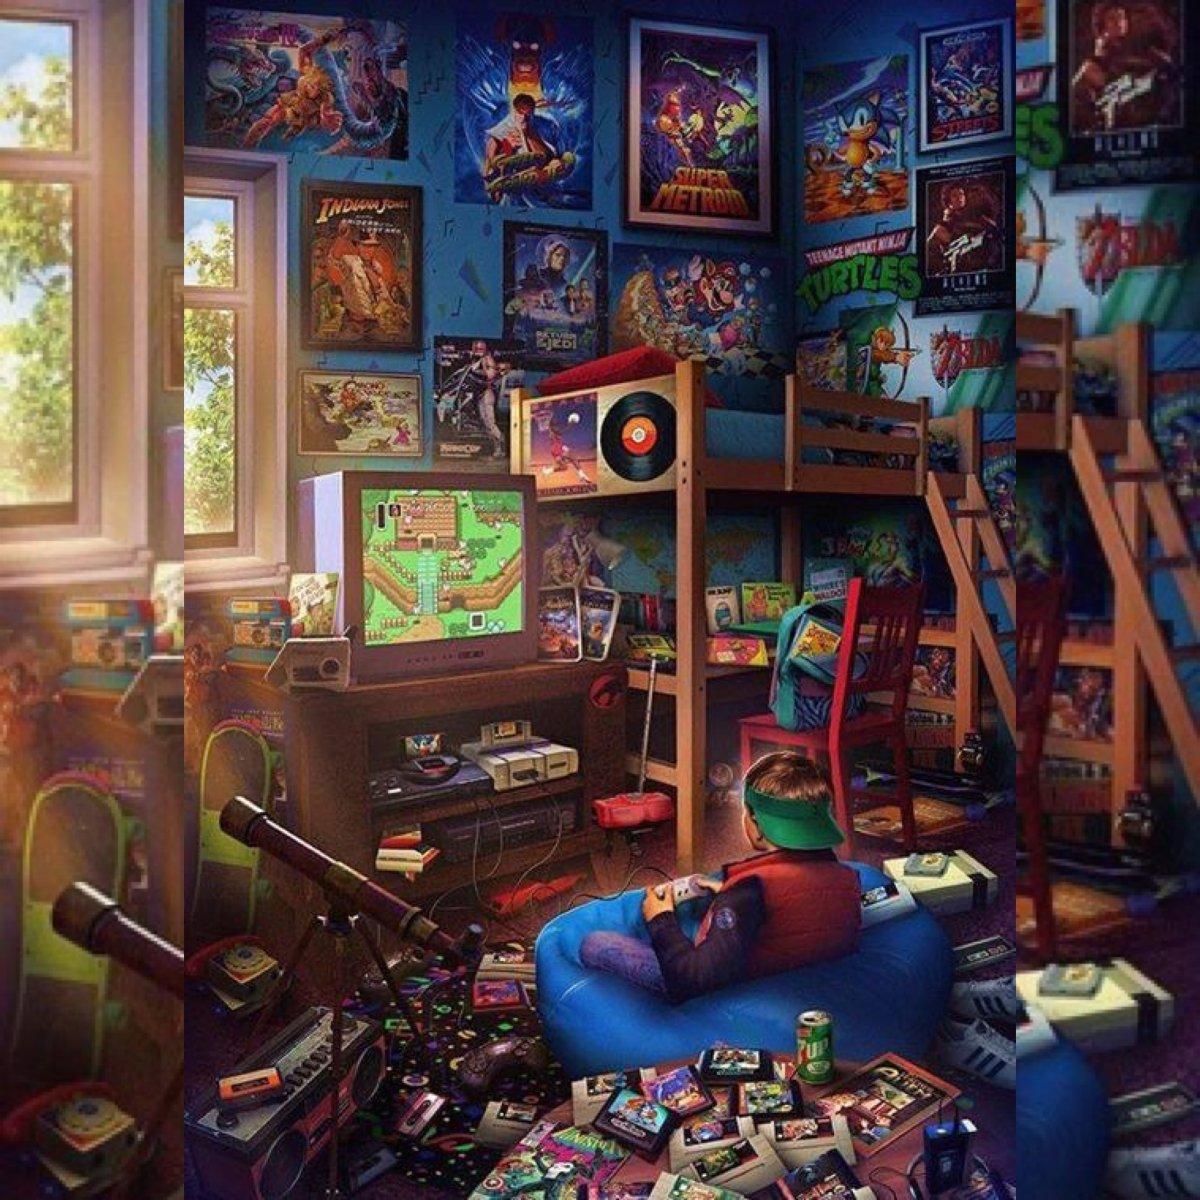 #nintendo #nintendocollection #nintendolife #nintendoswitch #gamer #retrogamer #videogames #8bit #gamertalk #geekgamer #classicgaming #gaming #gamersunite #retrocollector #gamerlife #retrogaming #gaminglifestyle  #gamingcommunity #retrogames #gaminglife #jlsgaming #16bit #retropic.twitter.com/EeqAGxTD7R